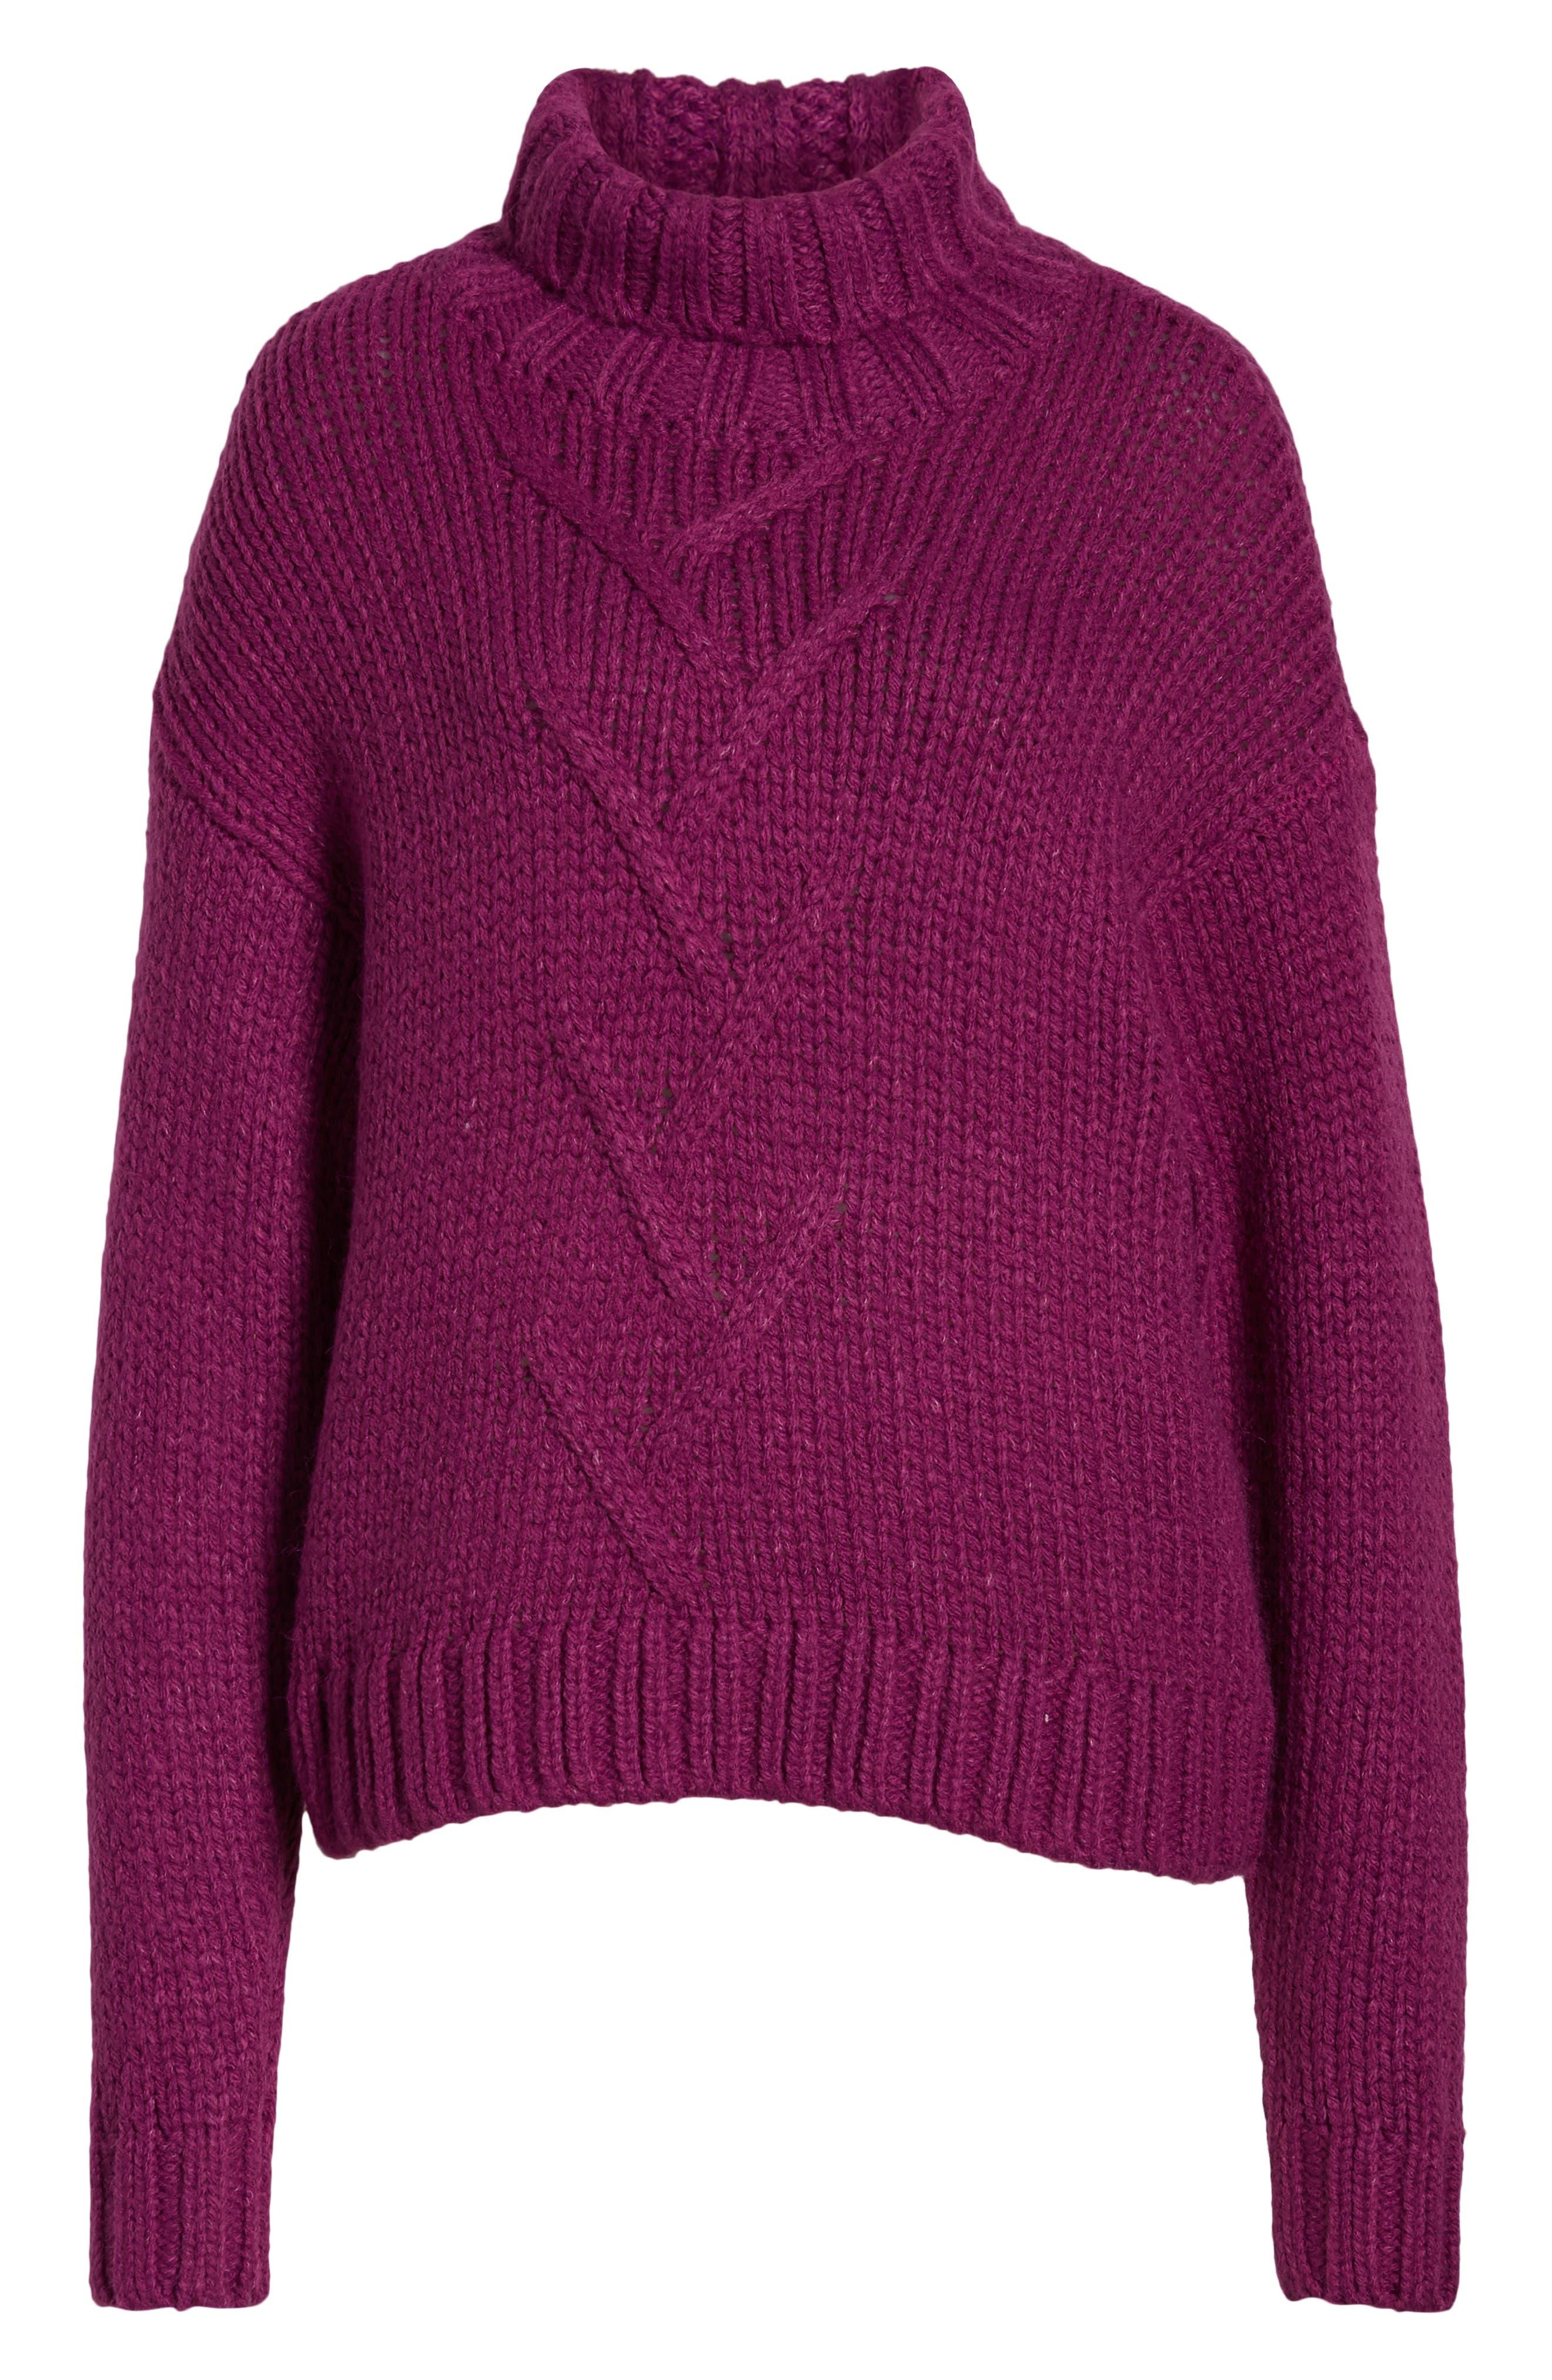 Kira Turtleneck Sweater,                             Alternate thumbnail 6, color,                             HOLLYHOCK